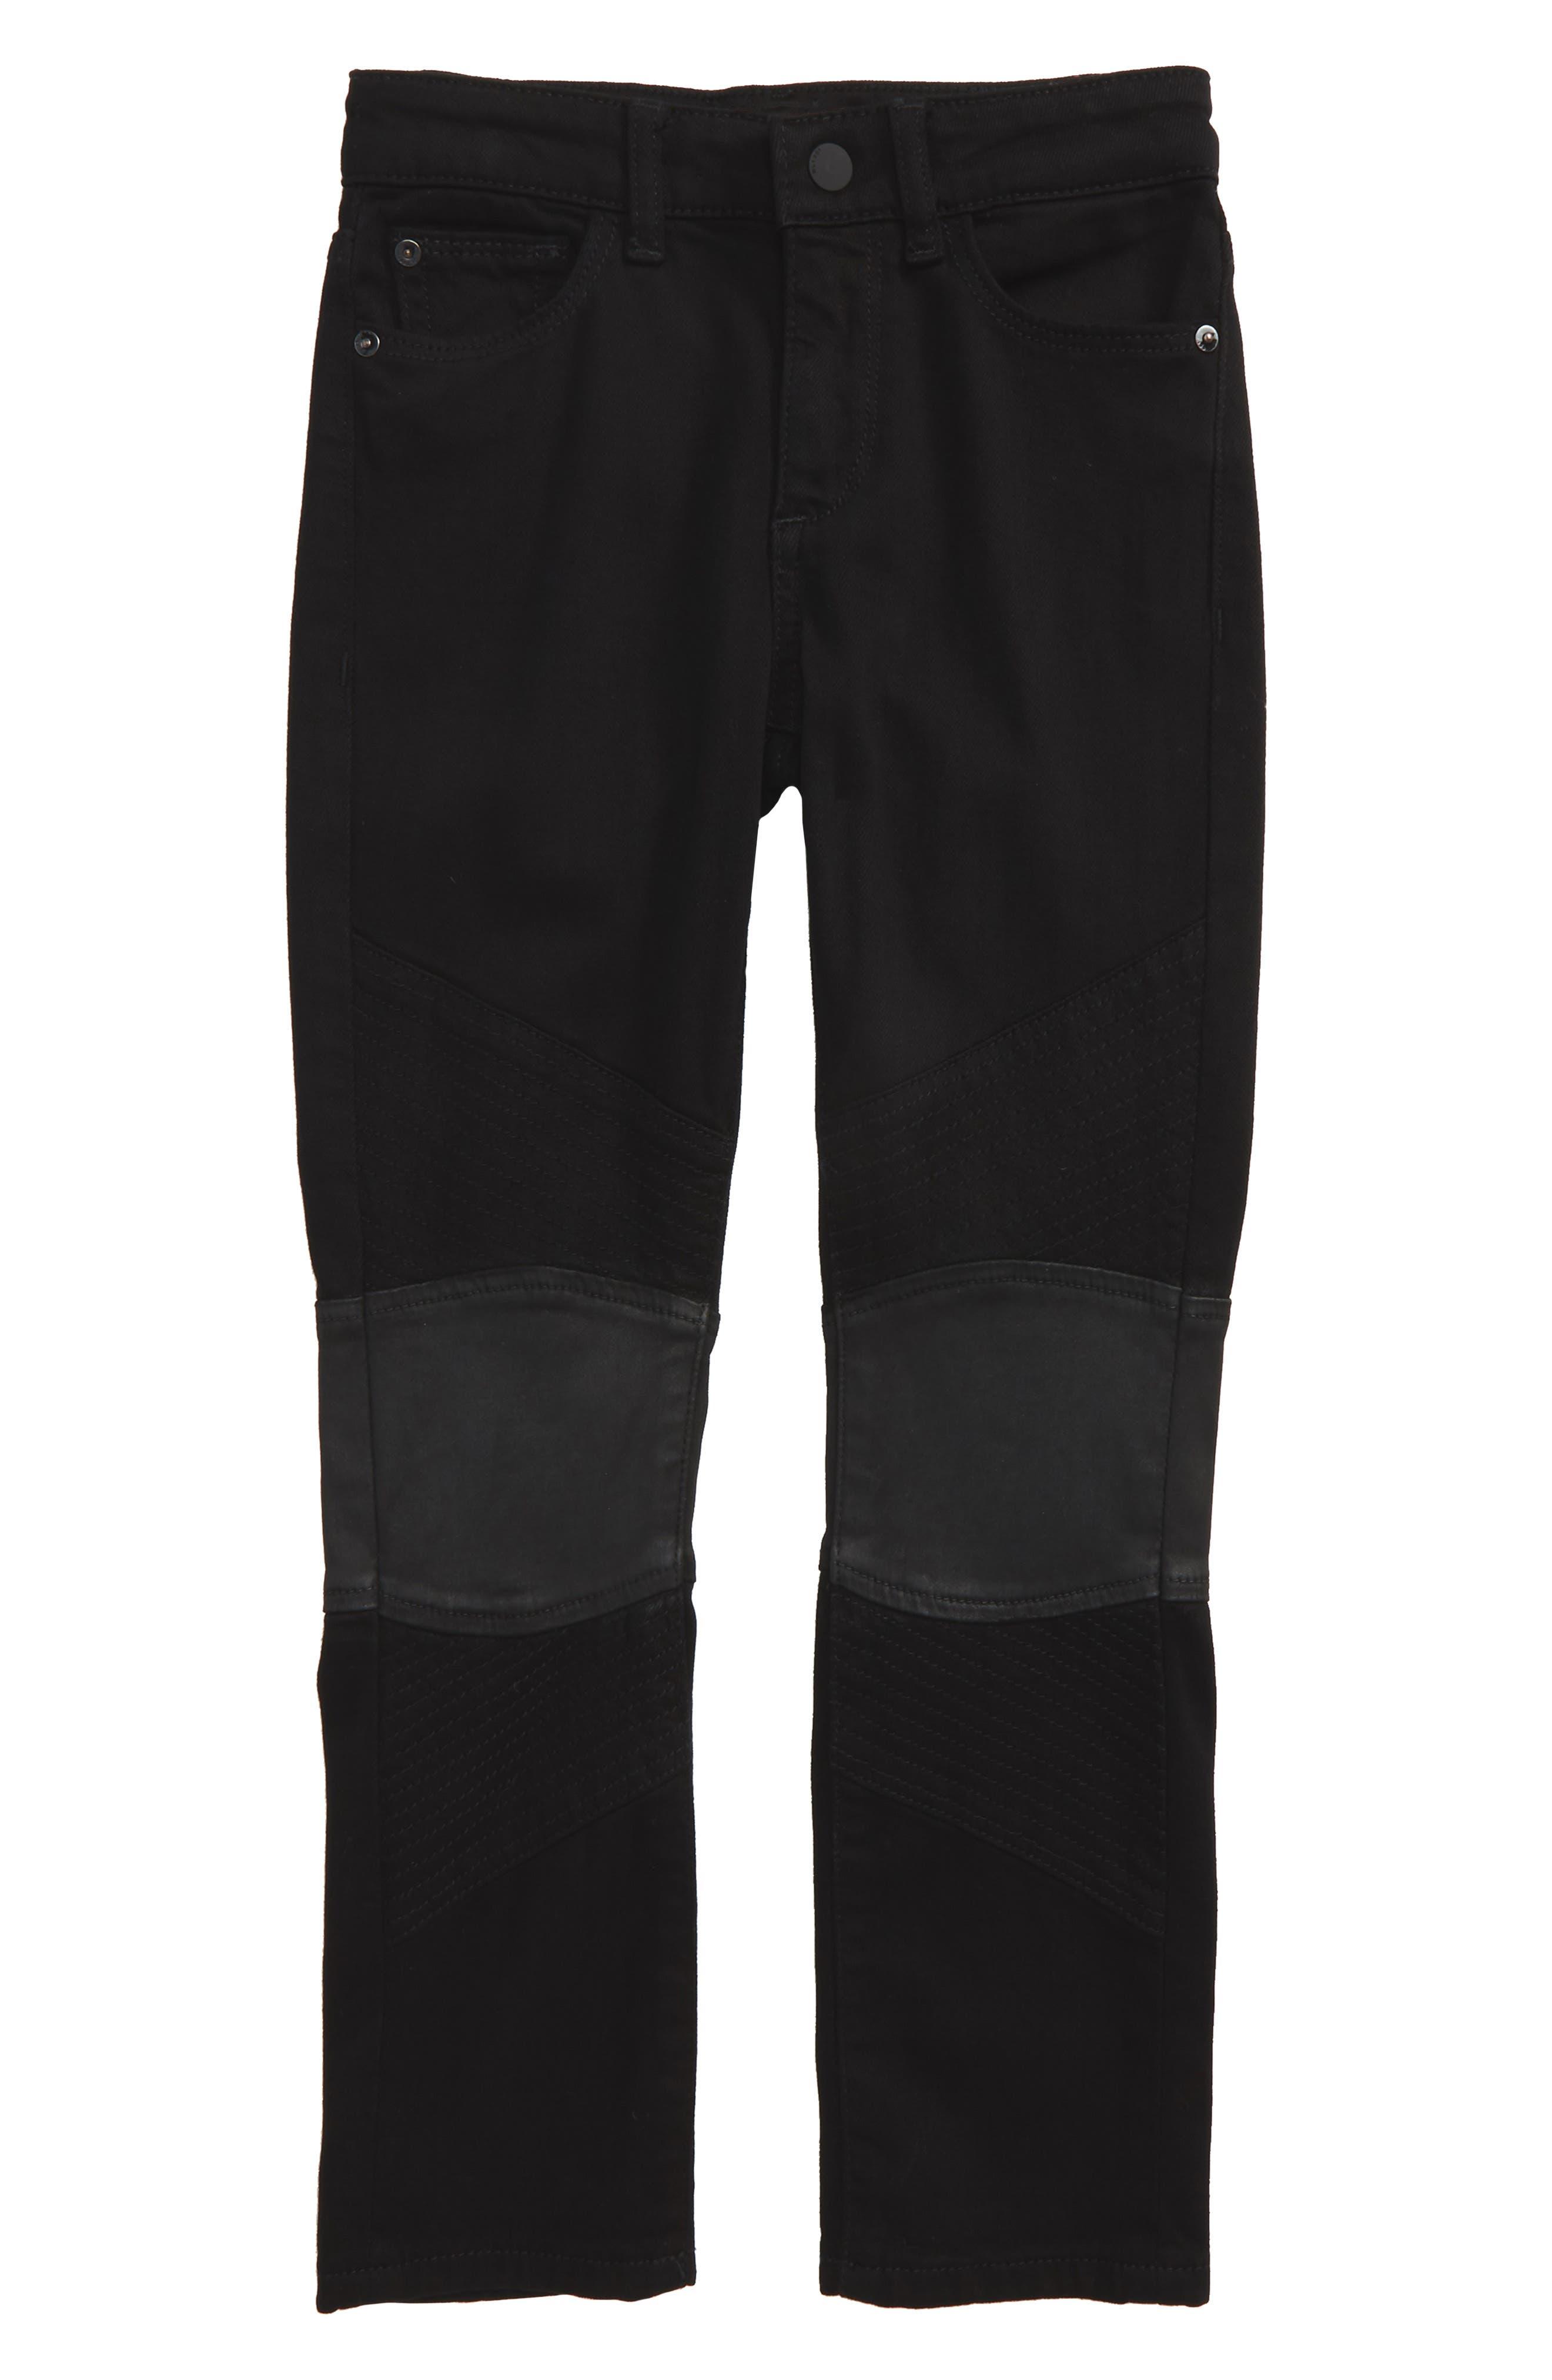 Hawke Skinny Moto Jeans,                             Main thumbnail 1, color,                             001